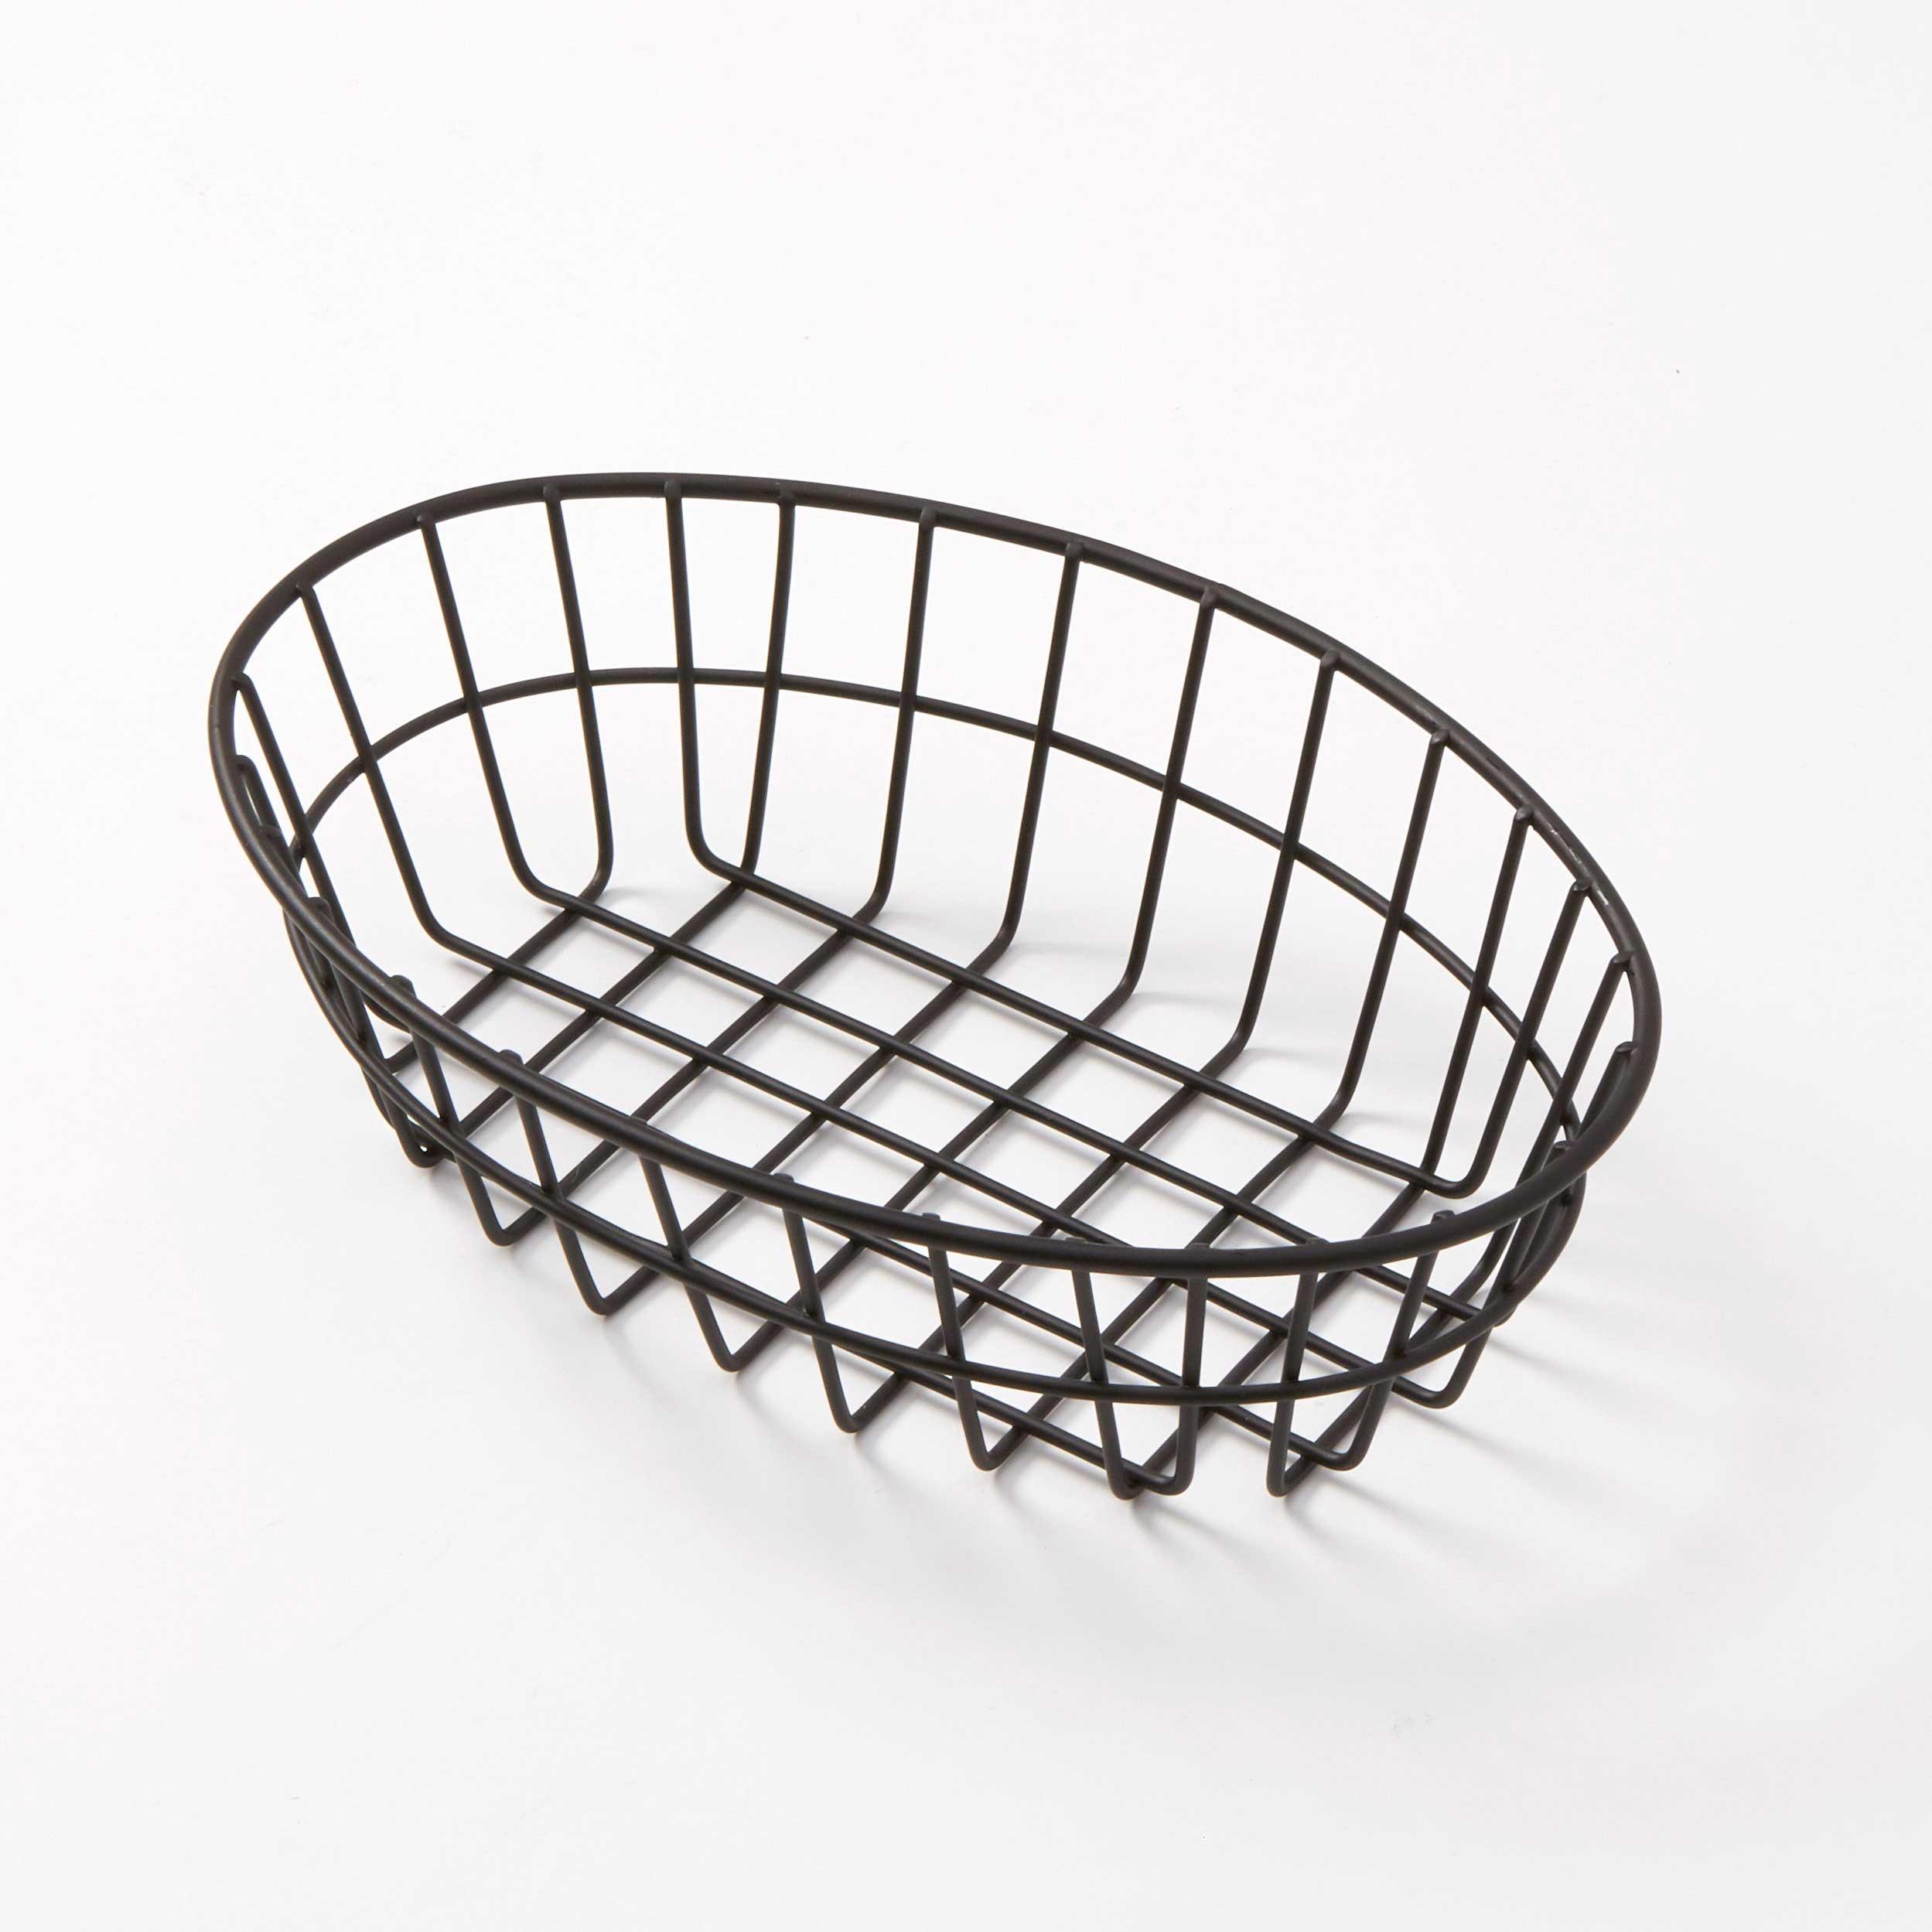 American Metalcraft GOVB69 basket, tabletop, metal